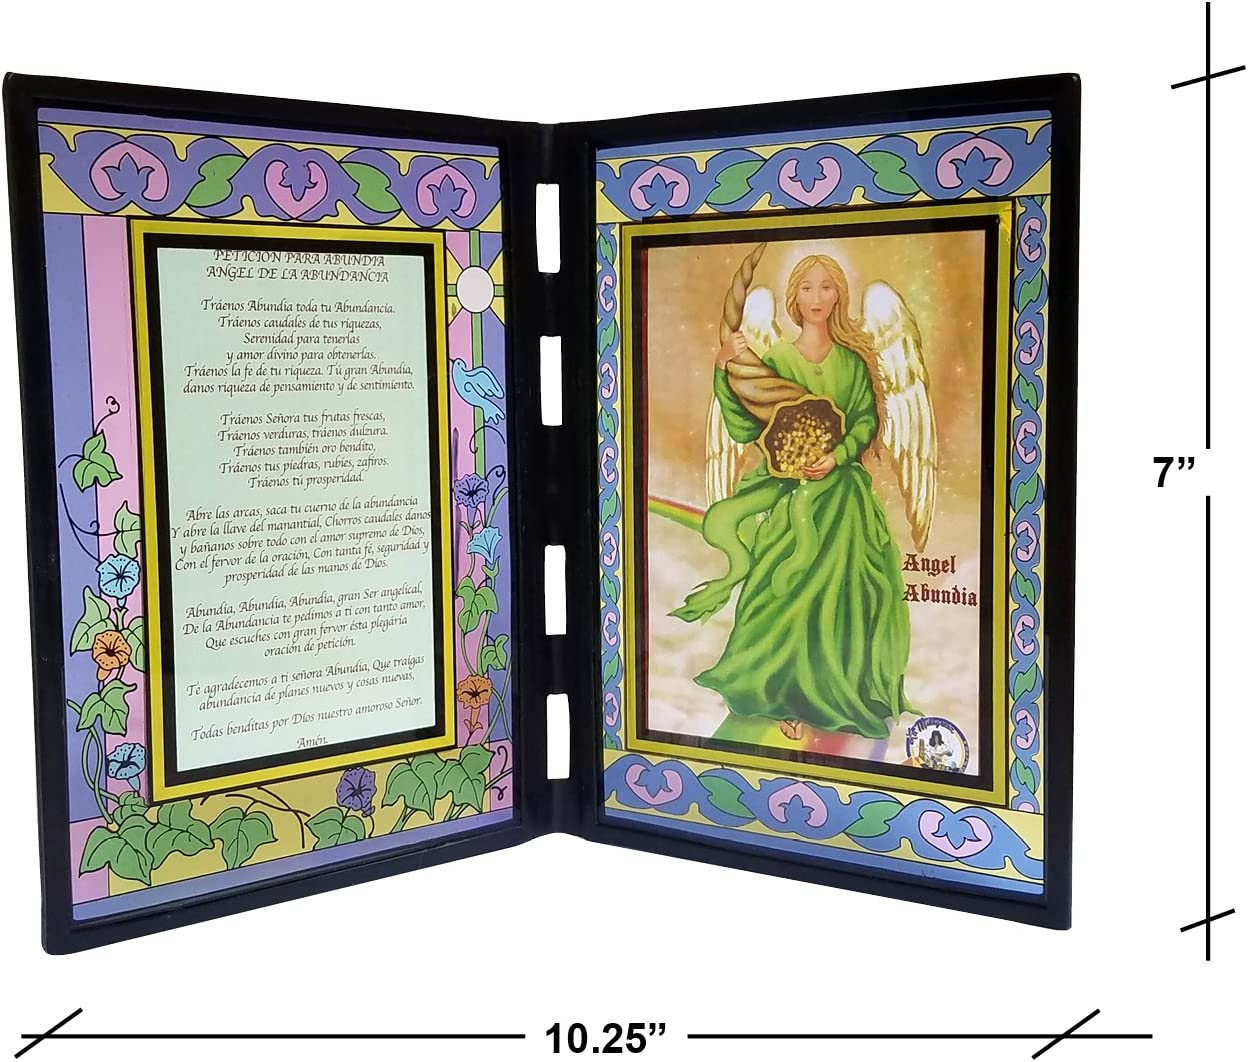 Amazon Com Productoslamilagrosa Com Abundia Angel Frame Abundancia Version Espanola Oracion Hecho En Estados Unidos Home Kitchen